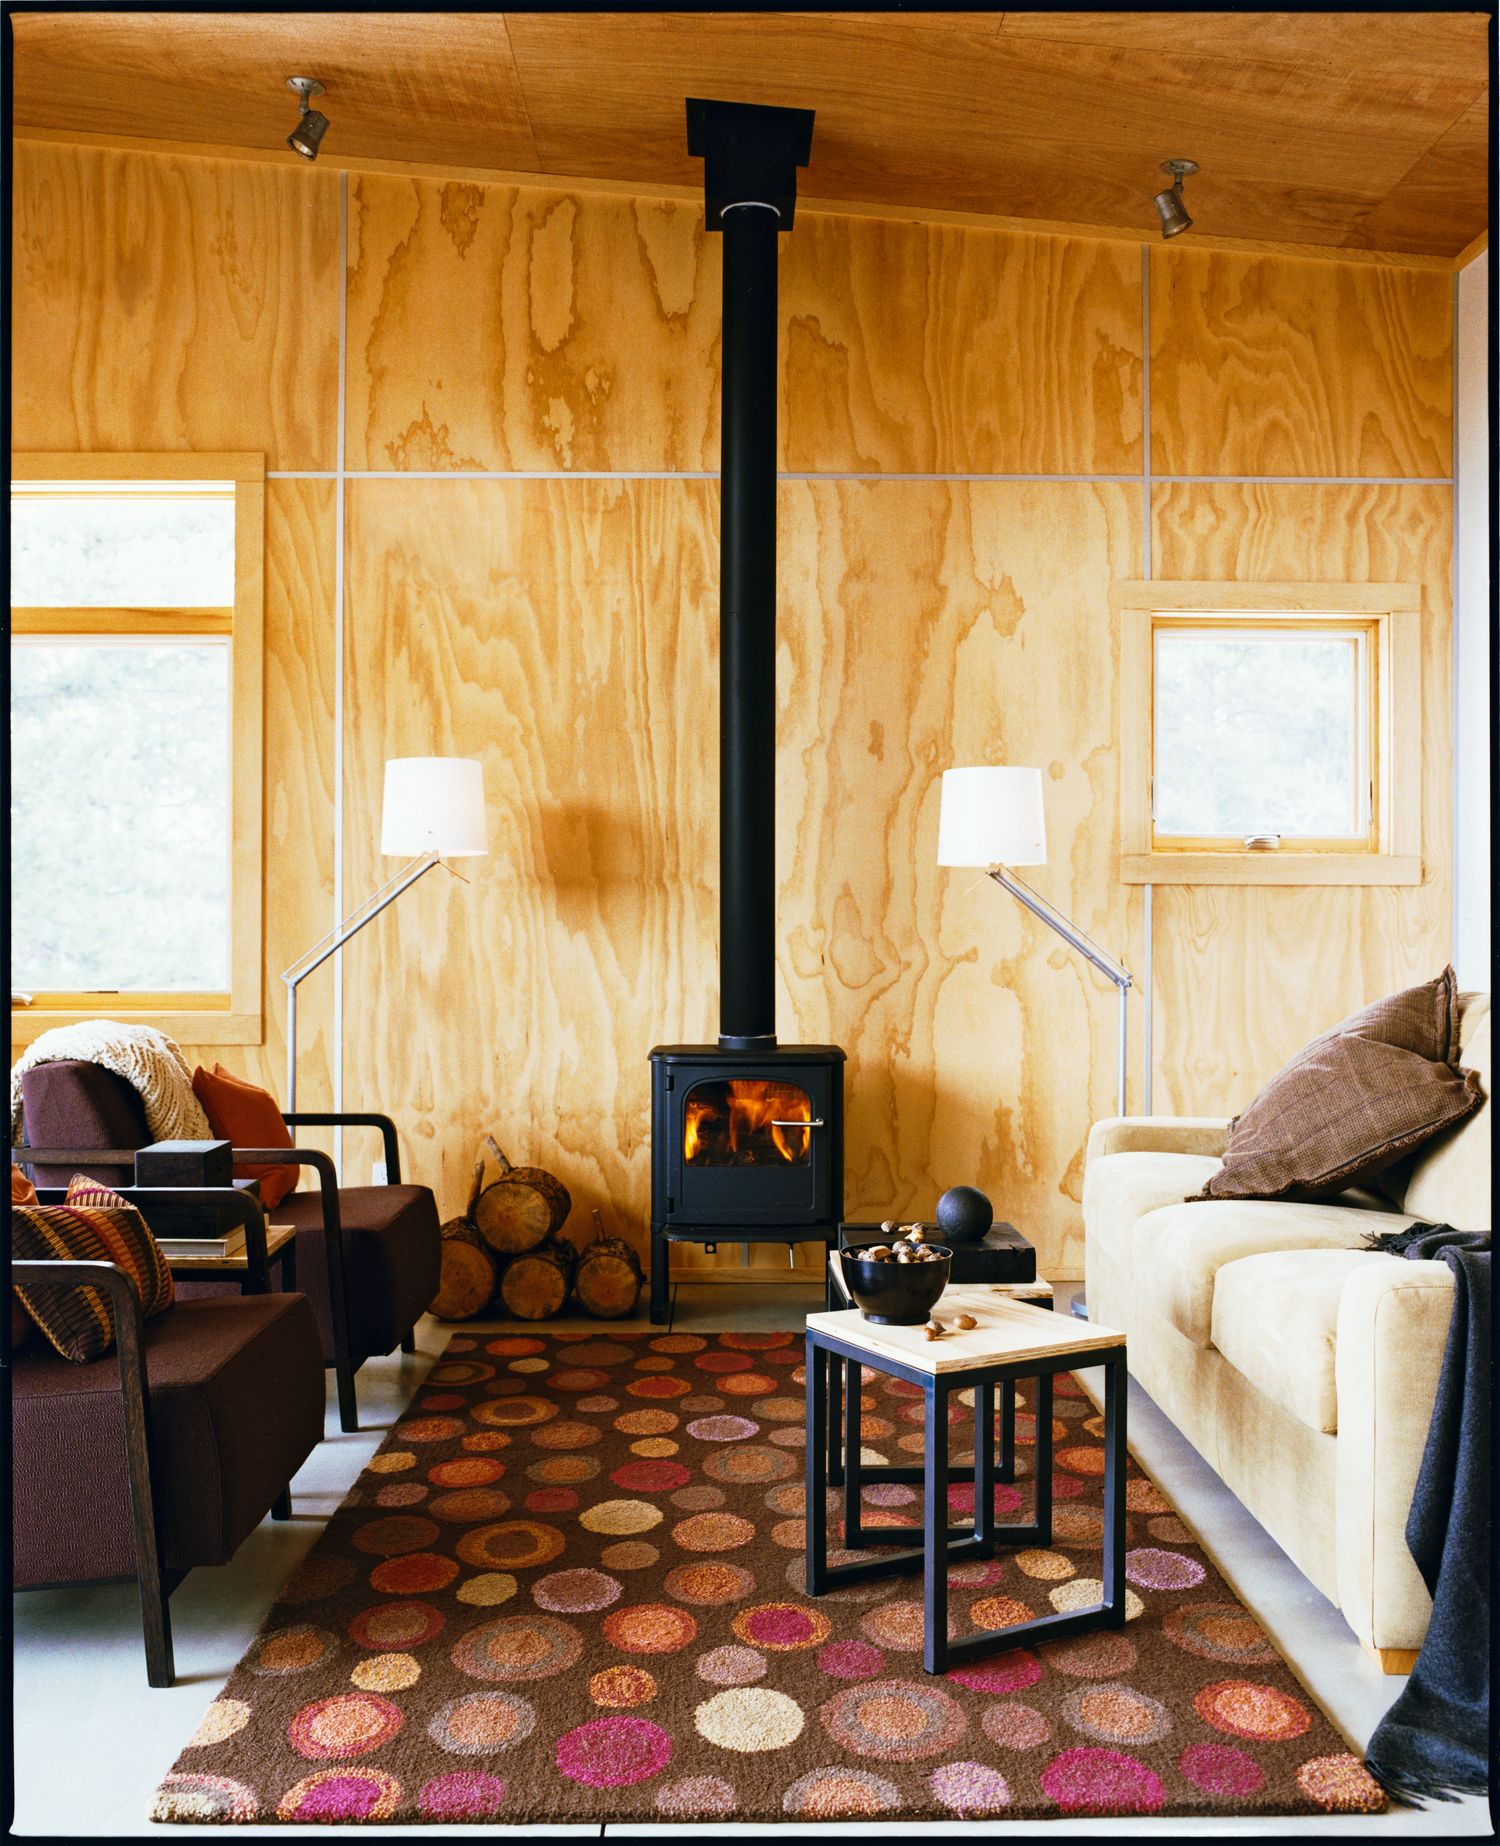 10 White Rustic Rooms: 10 Super-Cozy Rustic Living Rooms